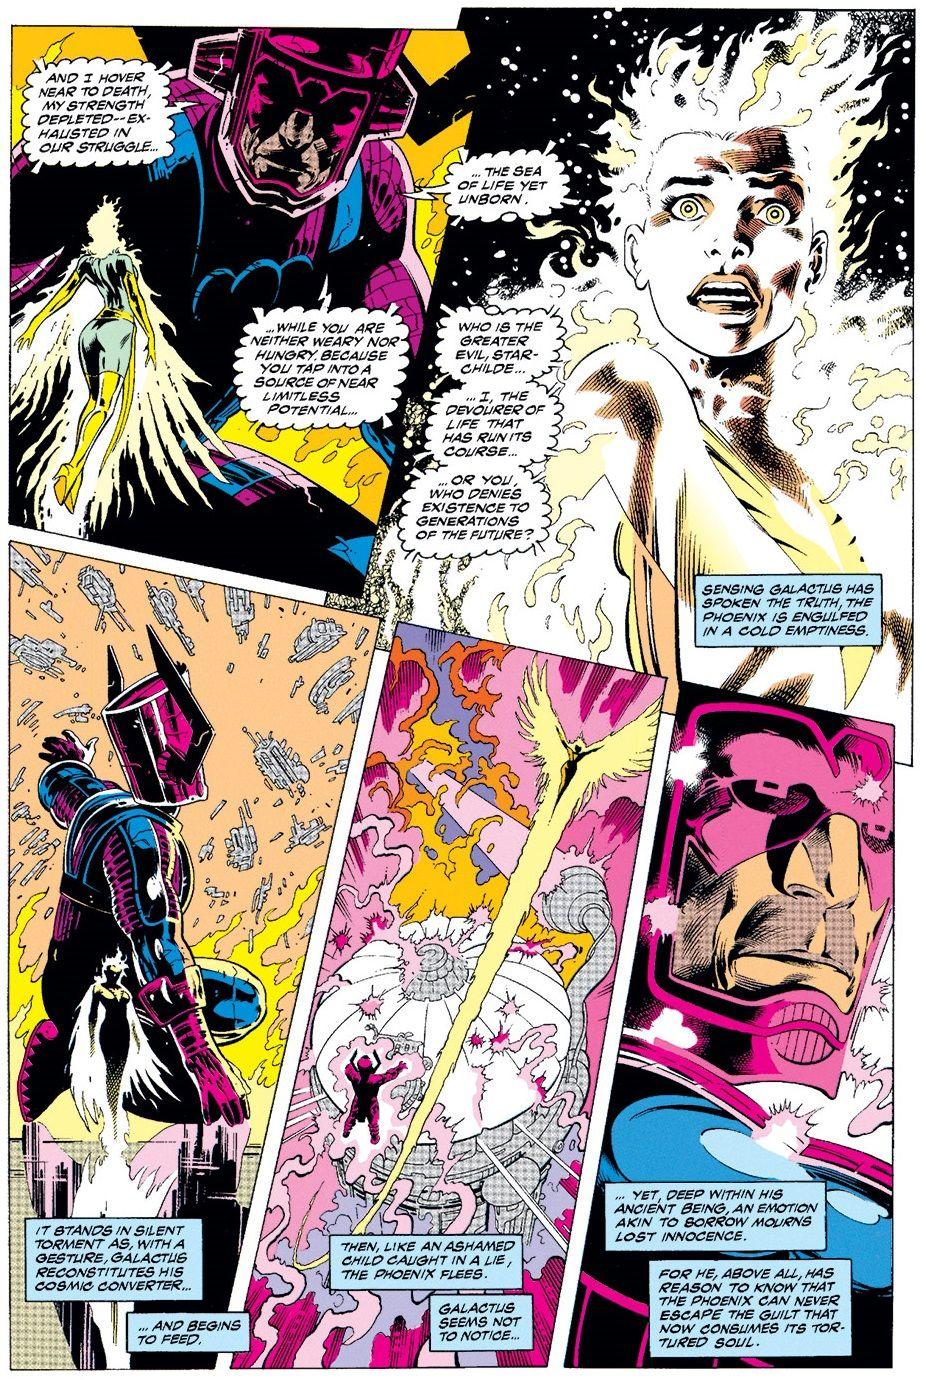 Phoenix vs Galactus in Excalibur #61 (1998) - Alan Davis